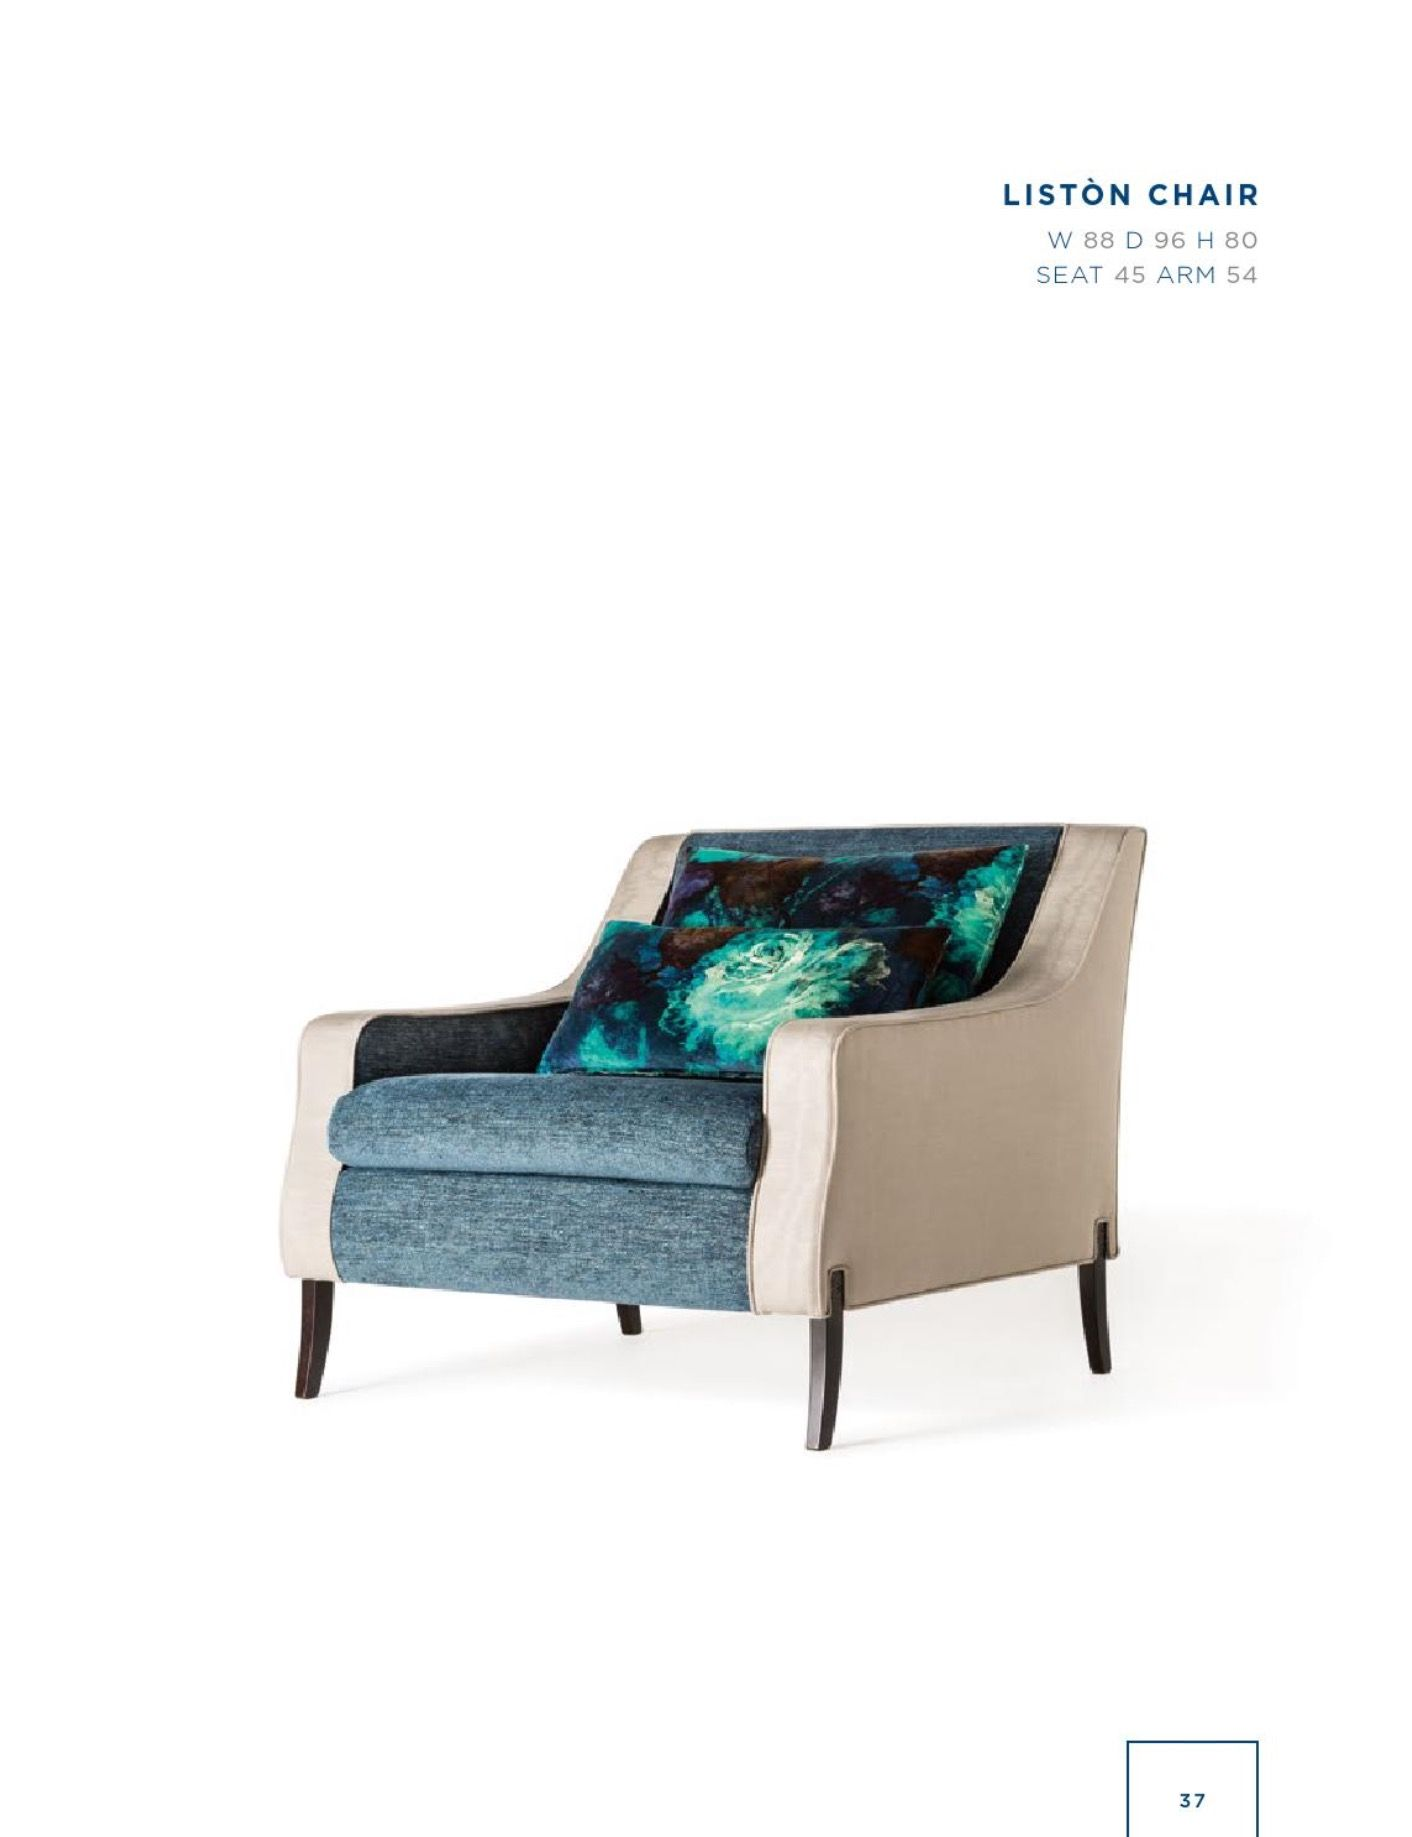 Rubelli Casa - Liston chair   家具   Pinterest   Armchairs, Living ...